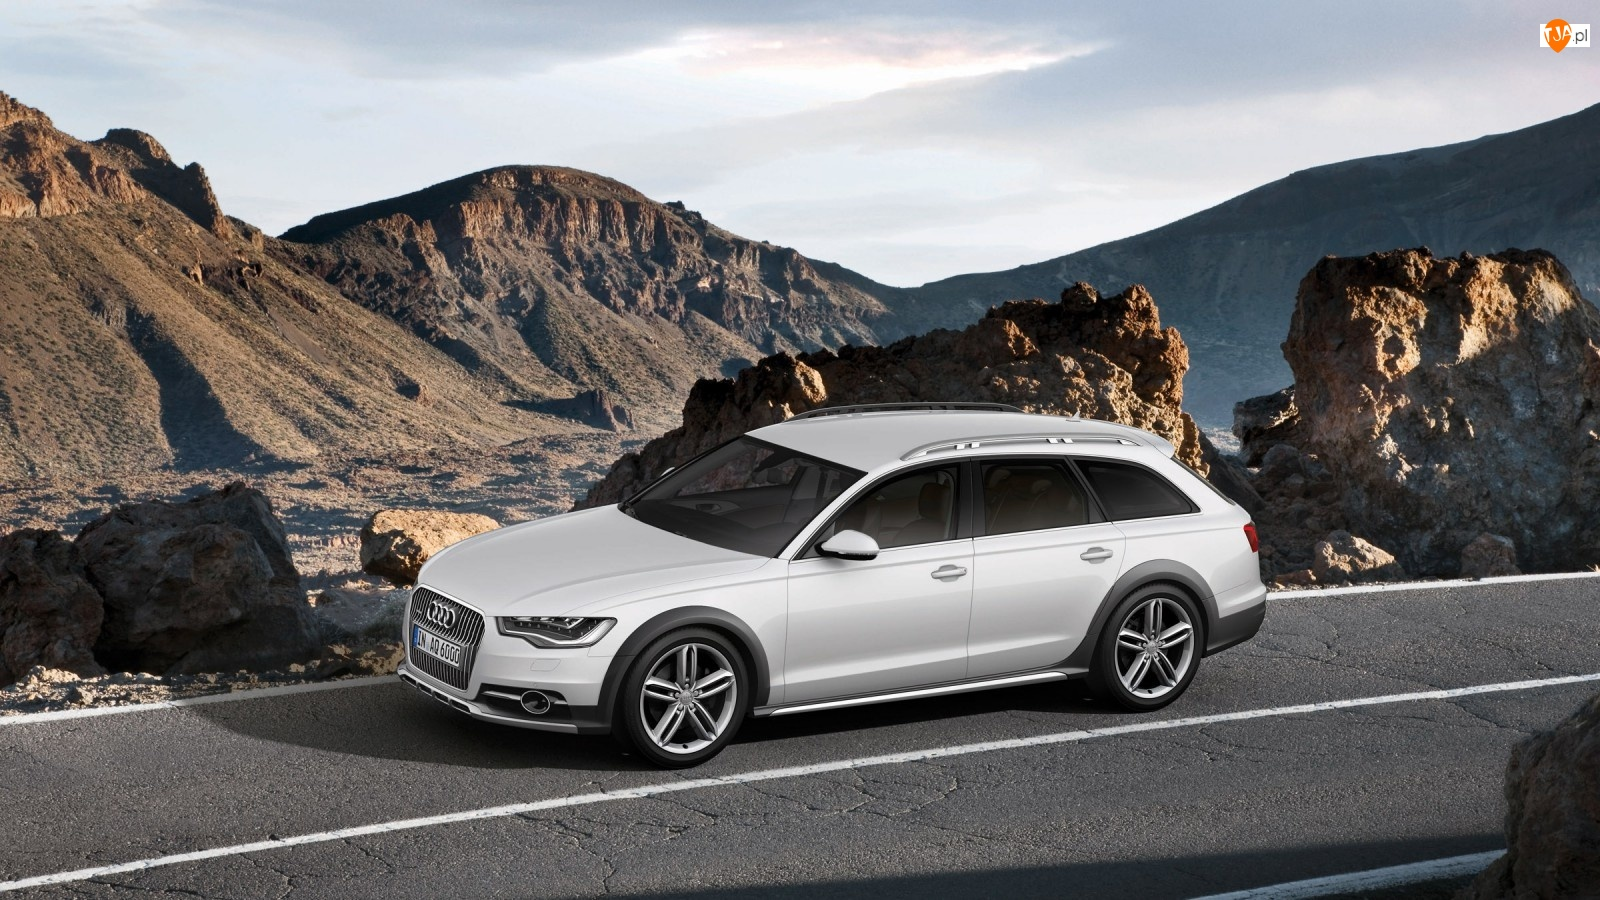 Audi A6, Góry, Allroad, Droga